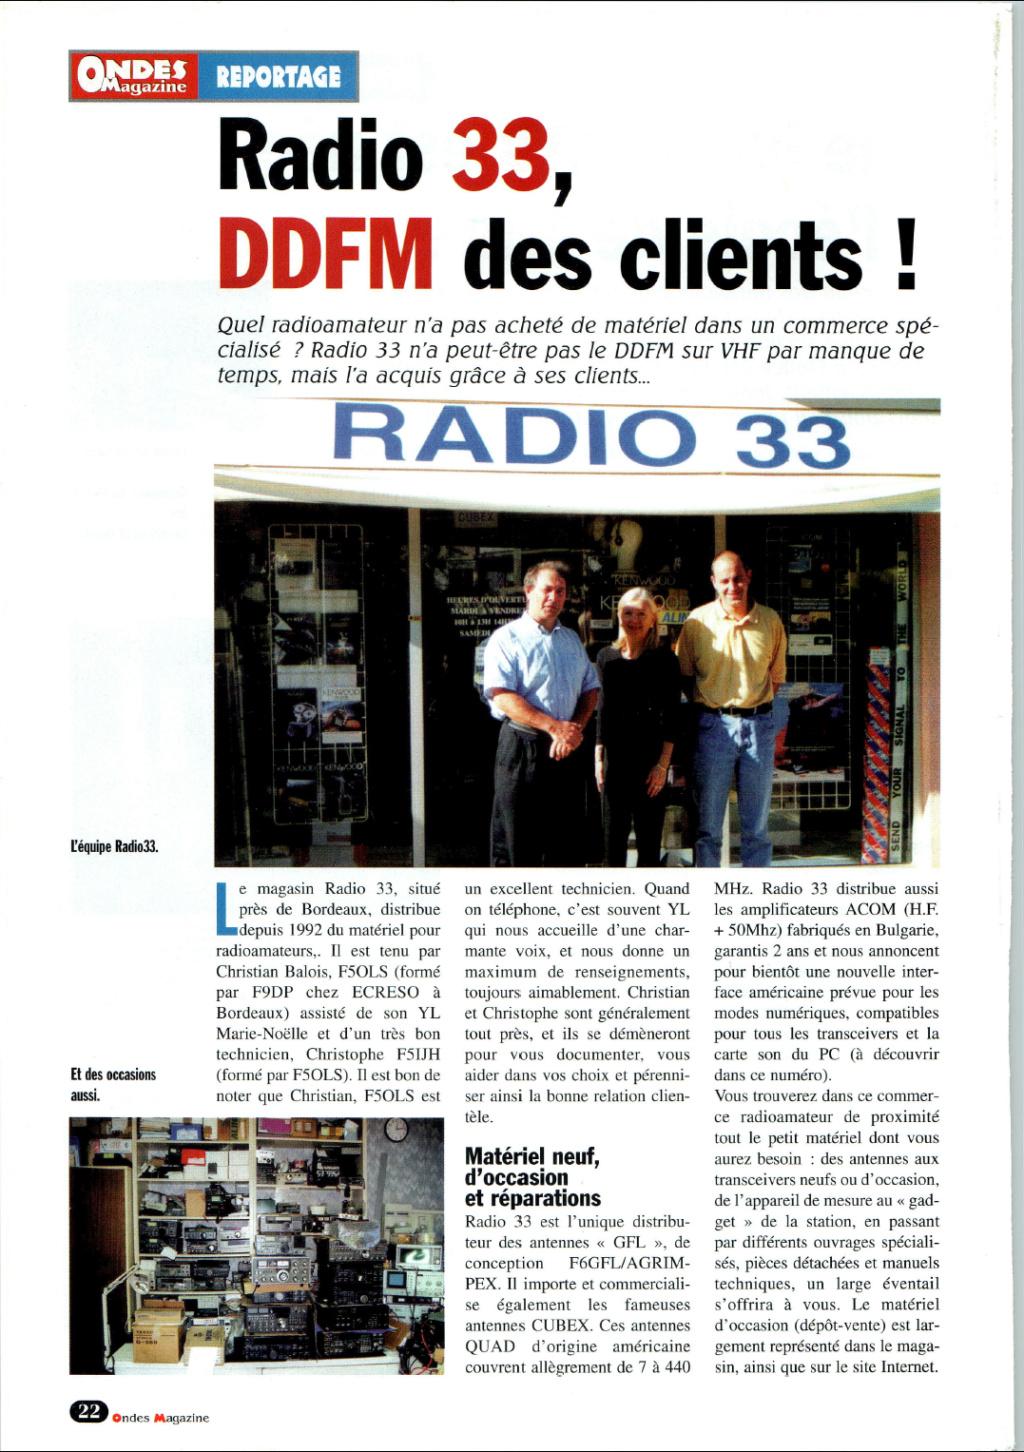 --> SAV-Radio33 - Service Après Vente Radio 33 (Sud-Ouest France) - Page 2 Captu168